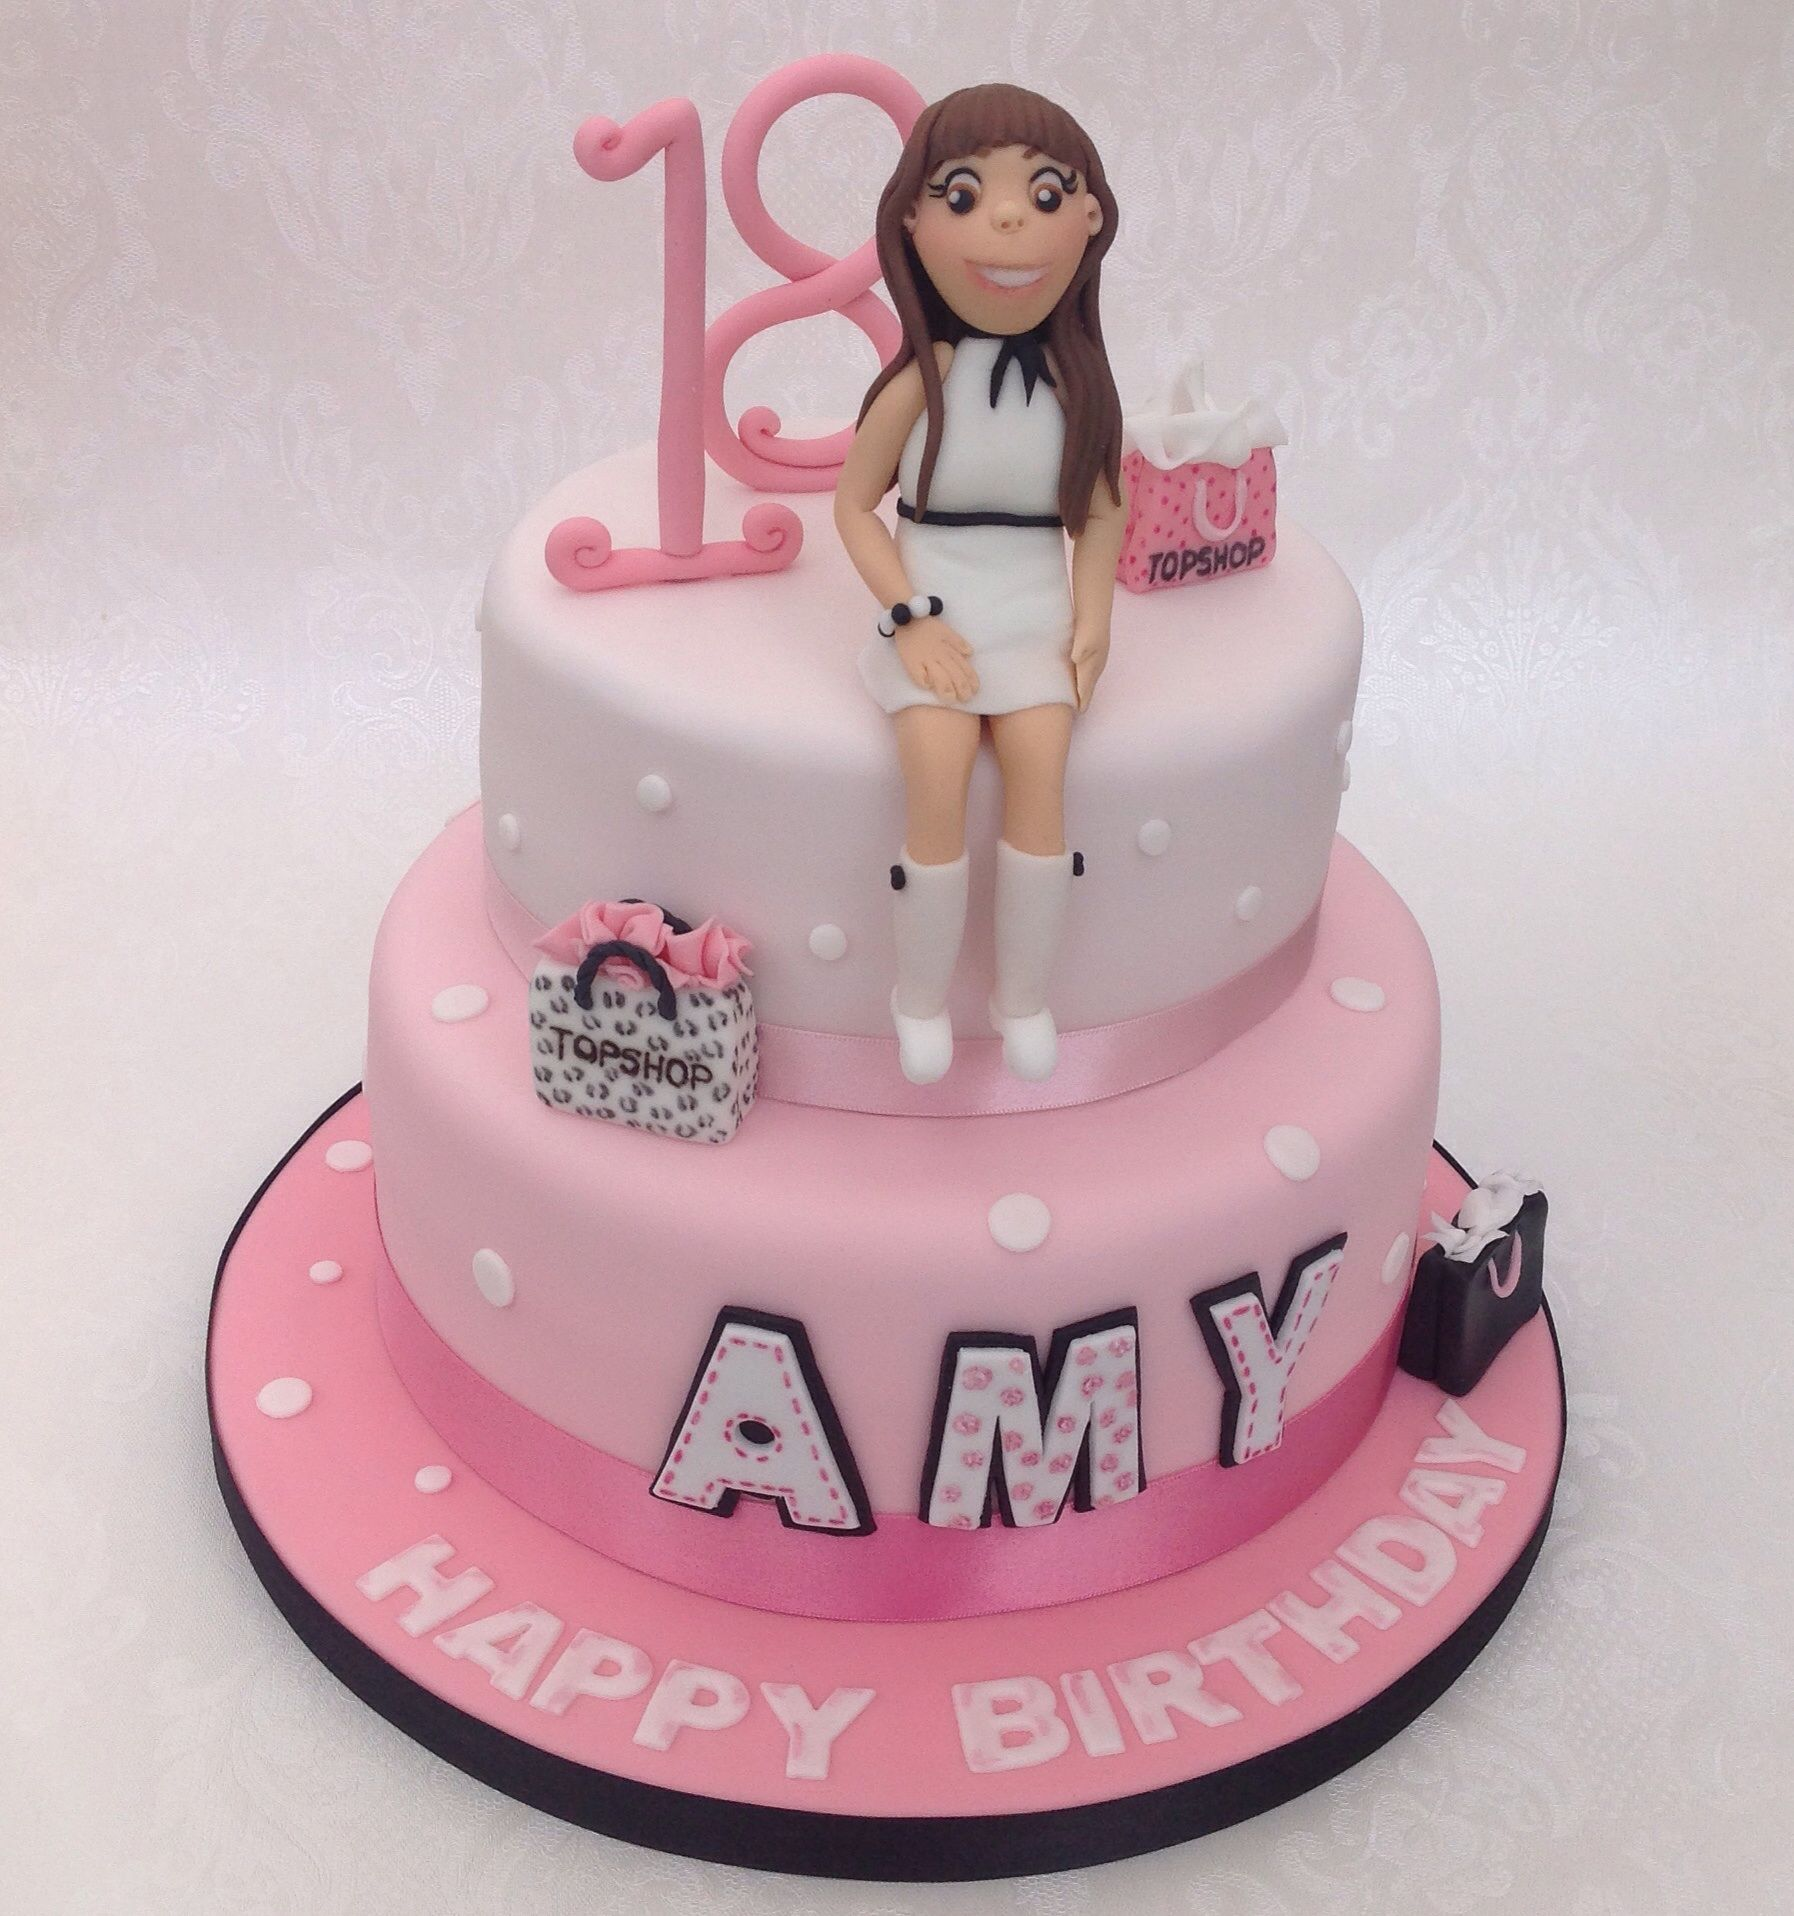 Top Shop 18th Birthday Cake